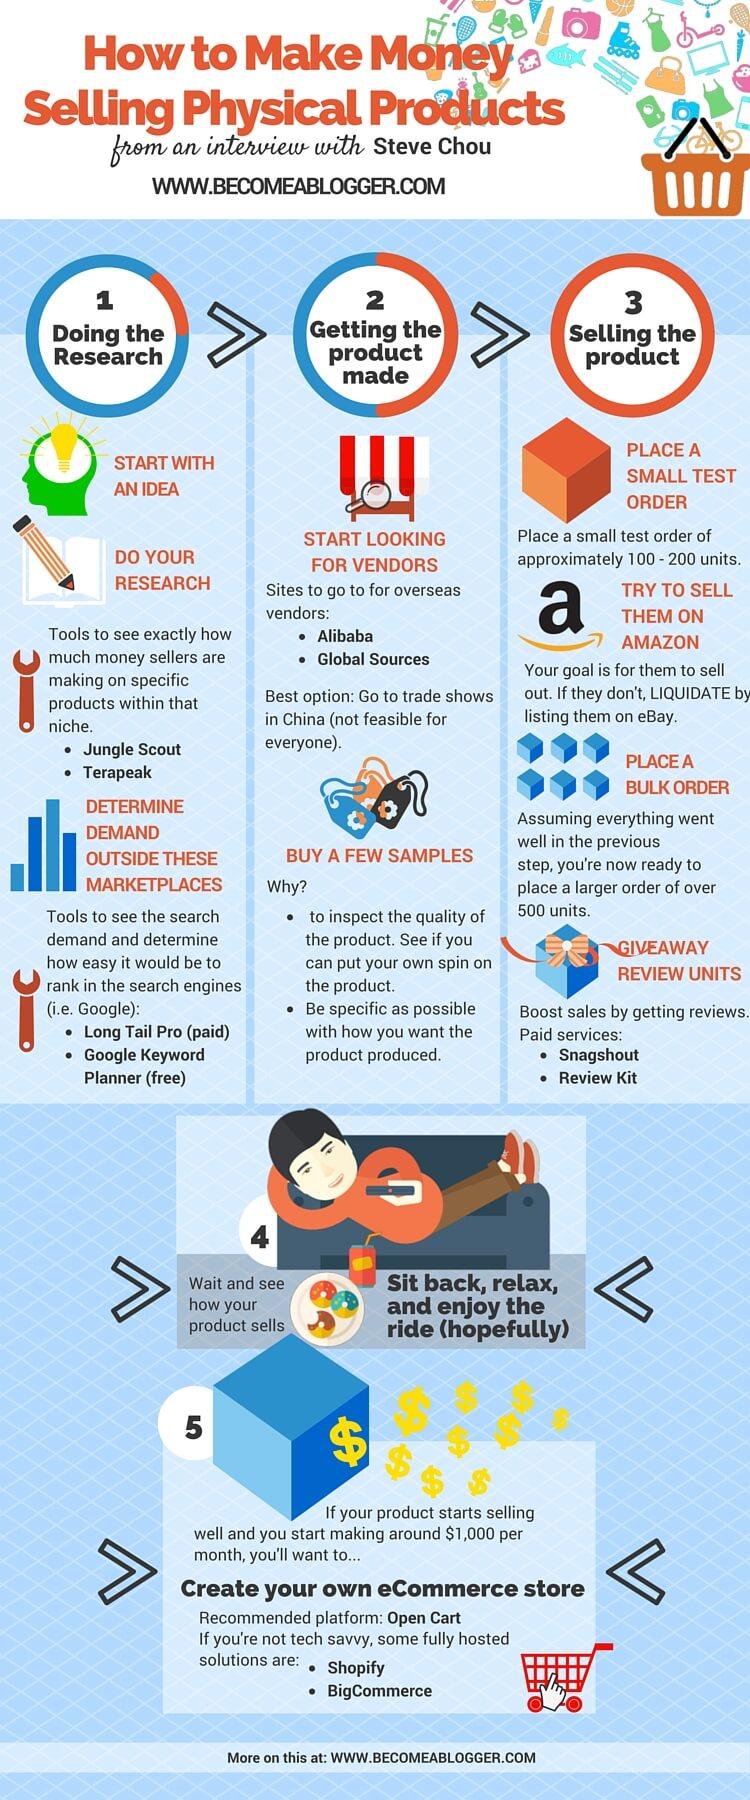 247_Steve Chou_Infographic_a